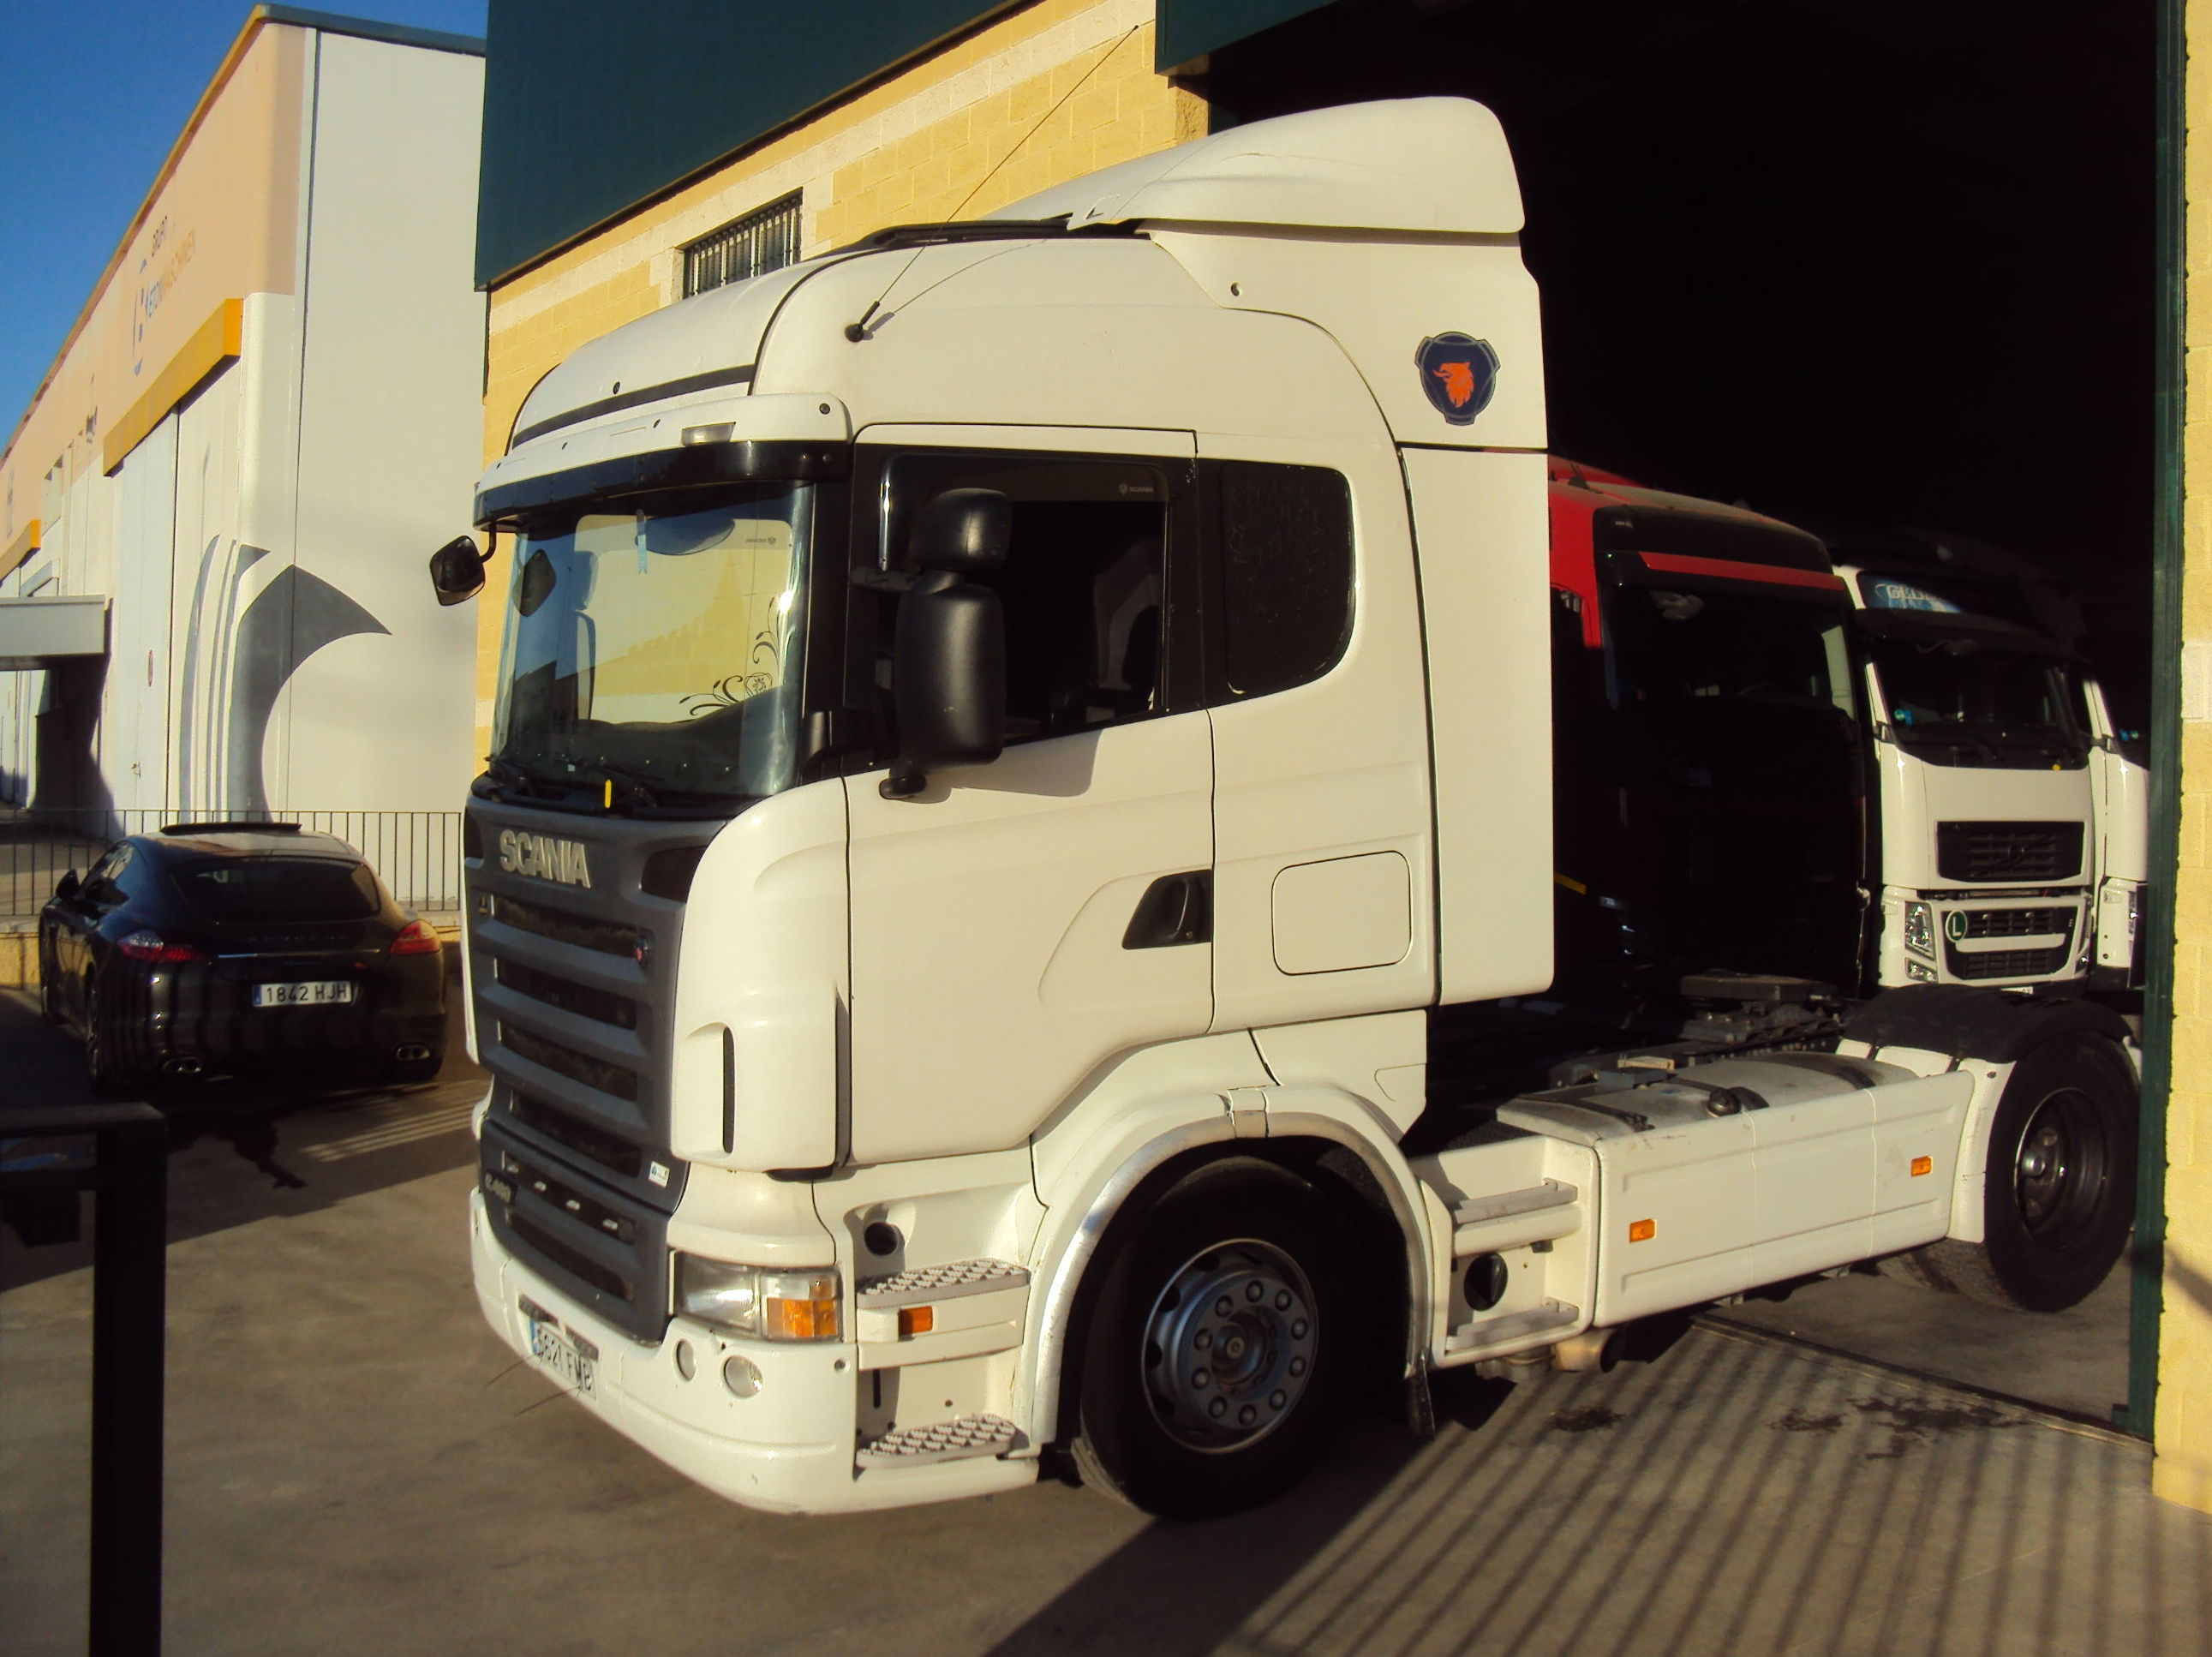 Scania R480 con RETARDER: Servicios de Talleres Joaquín López, S.L.